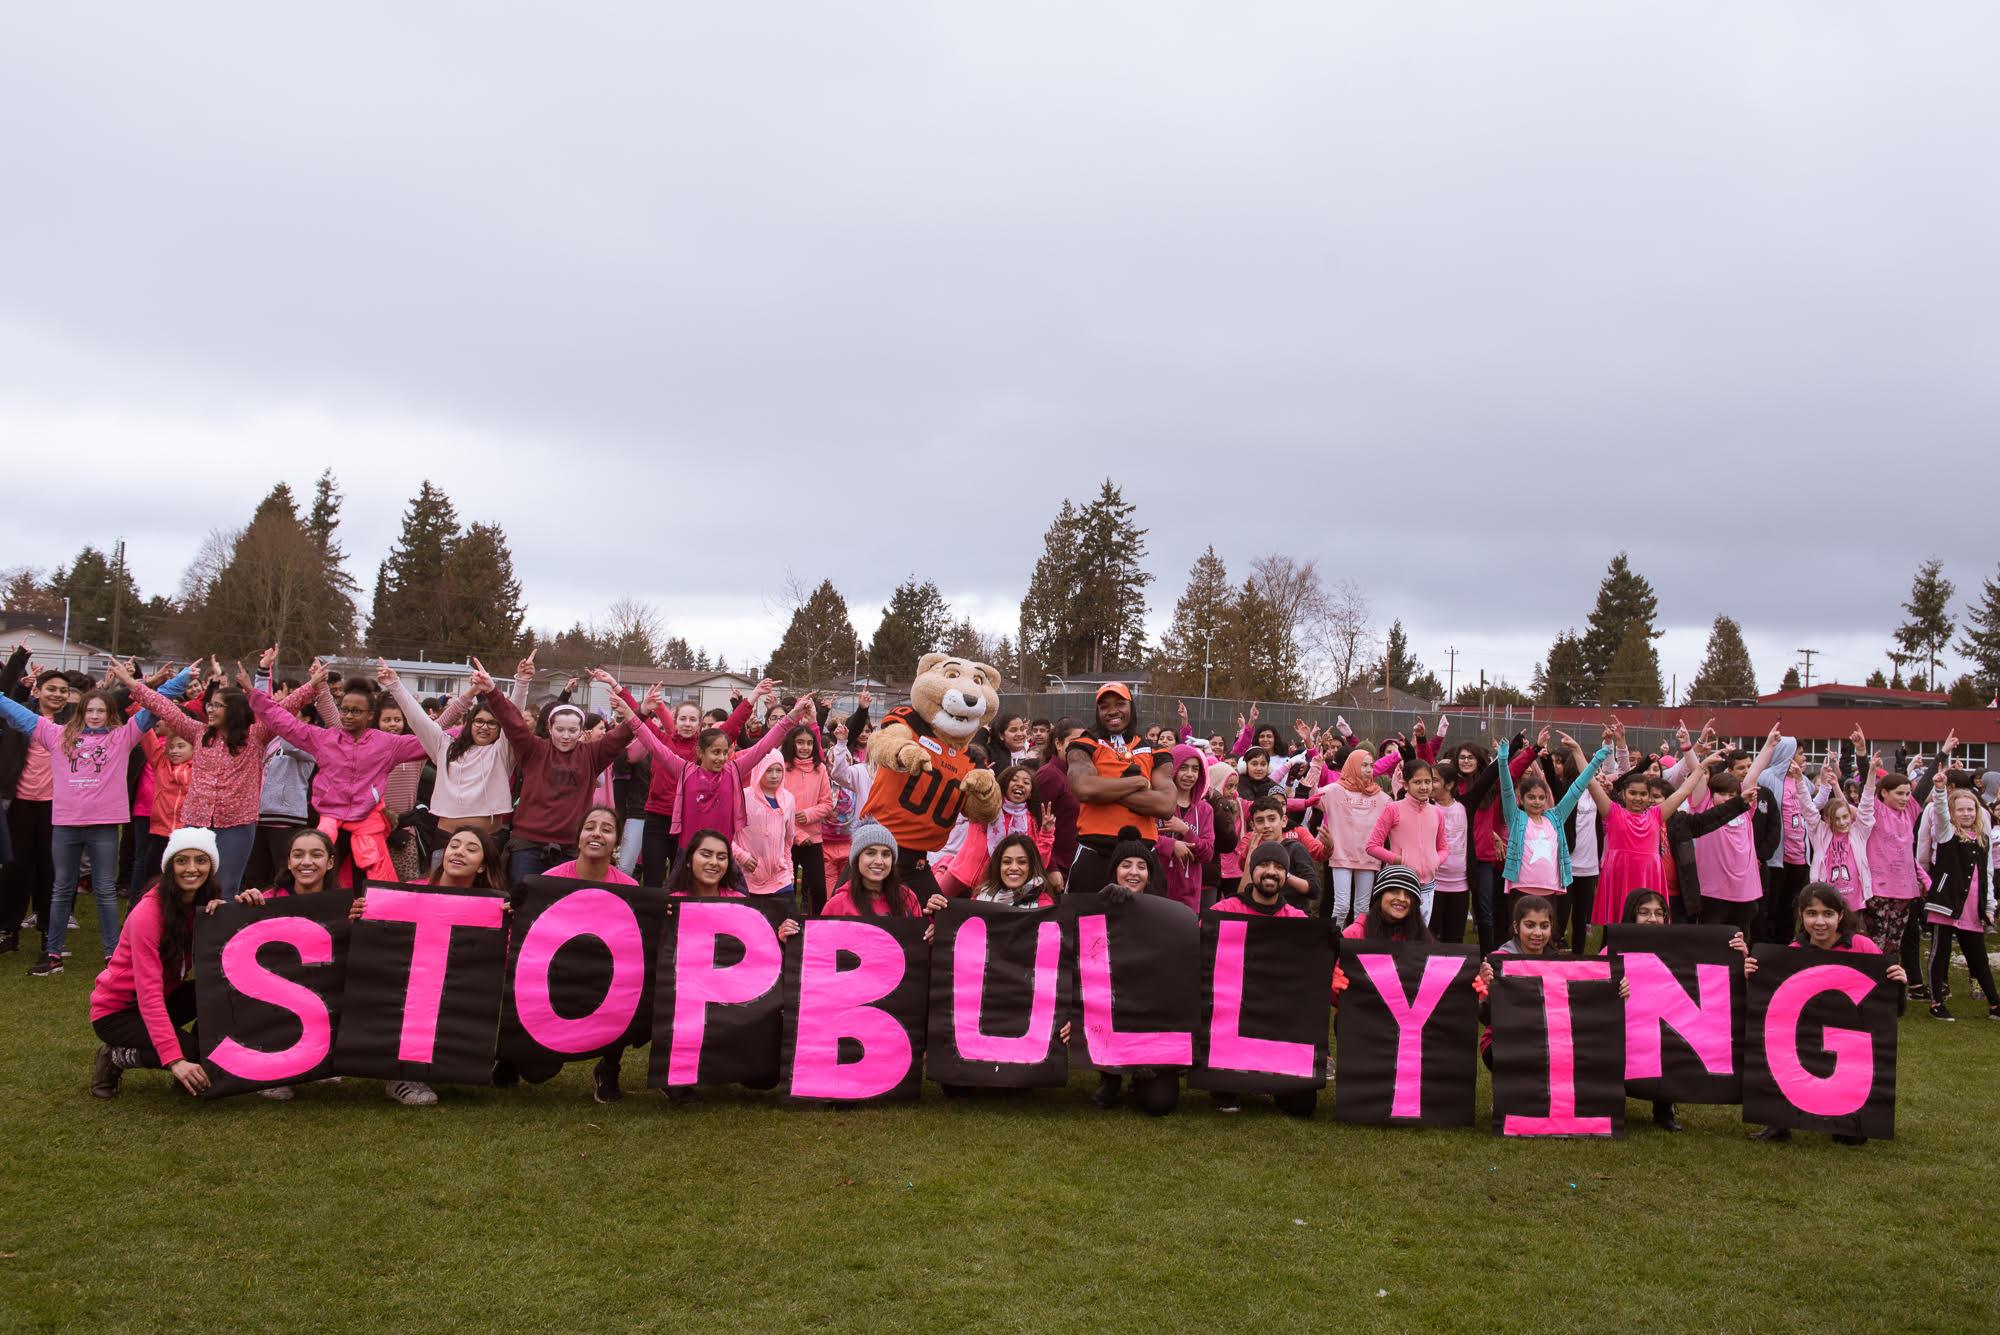 vancouver anti-bullying flash mob